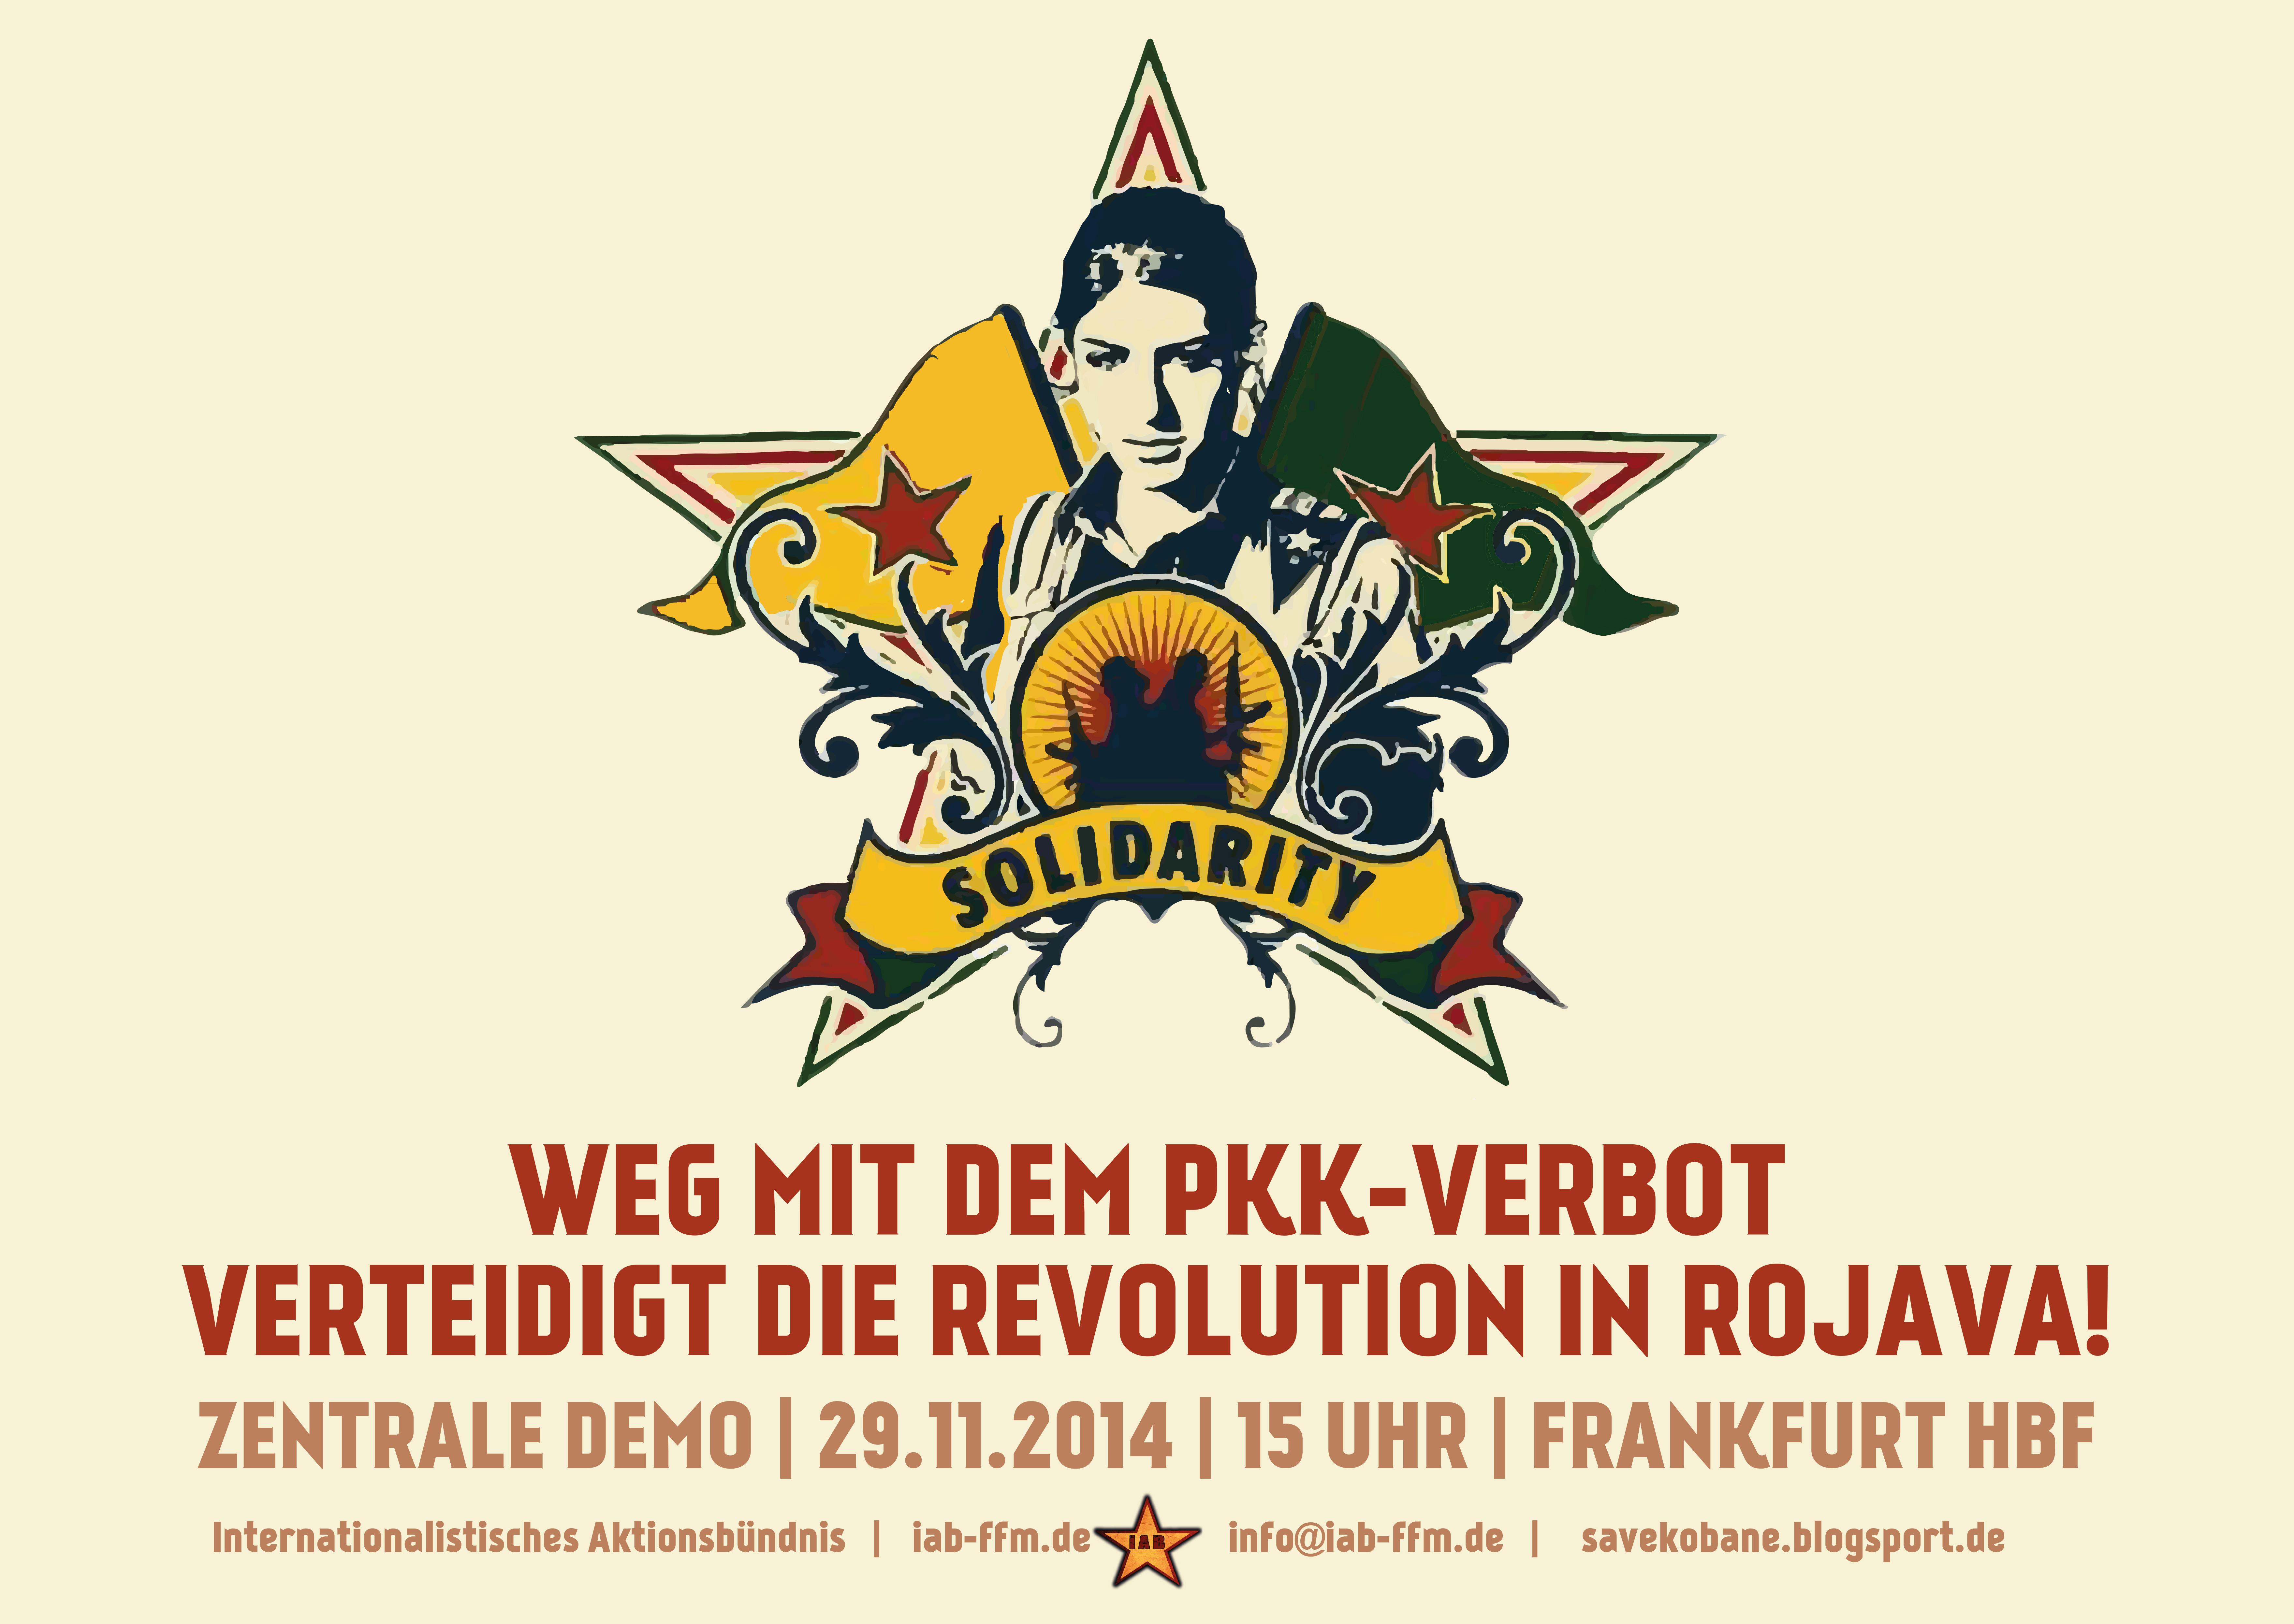 Demo_PKK-Verbot_FFM